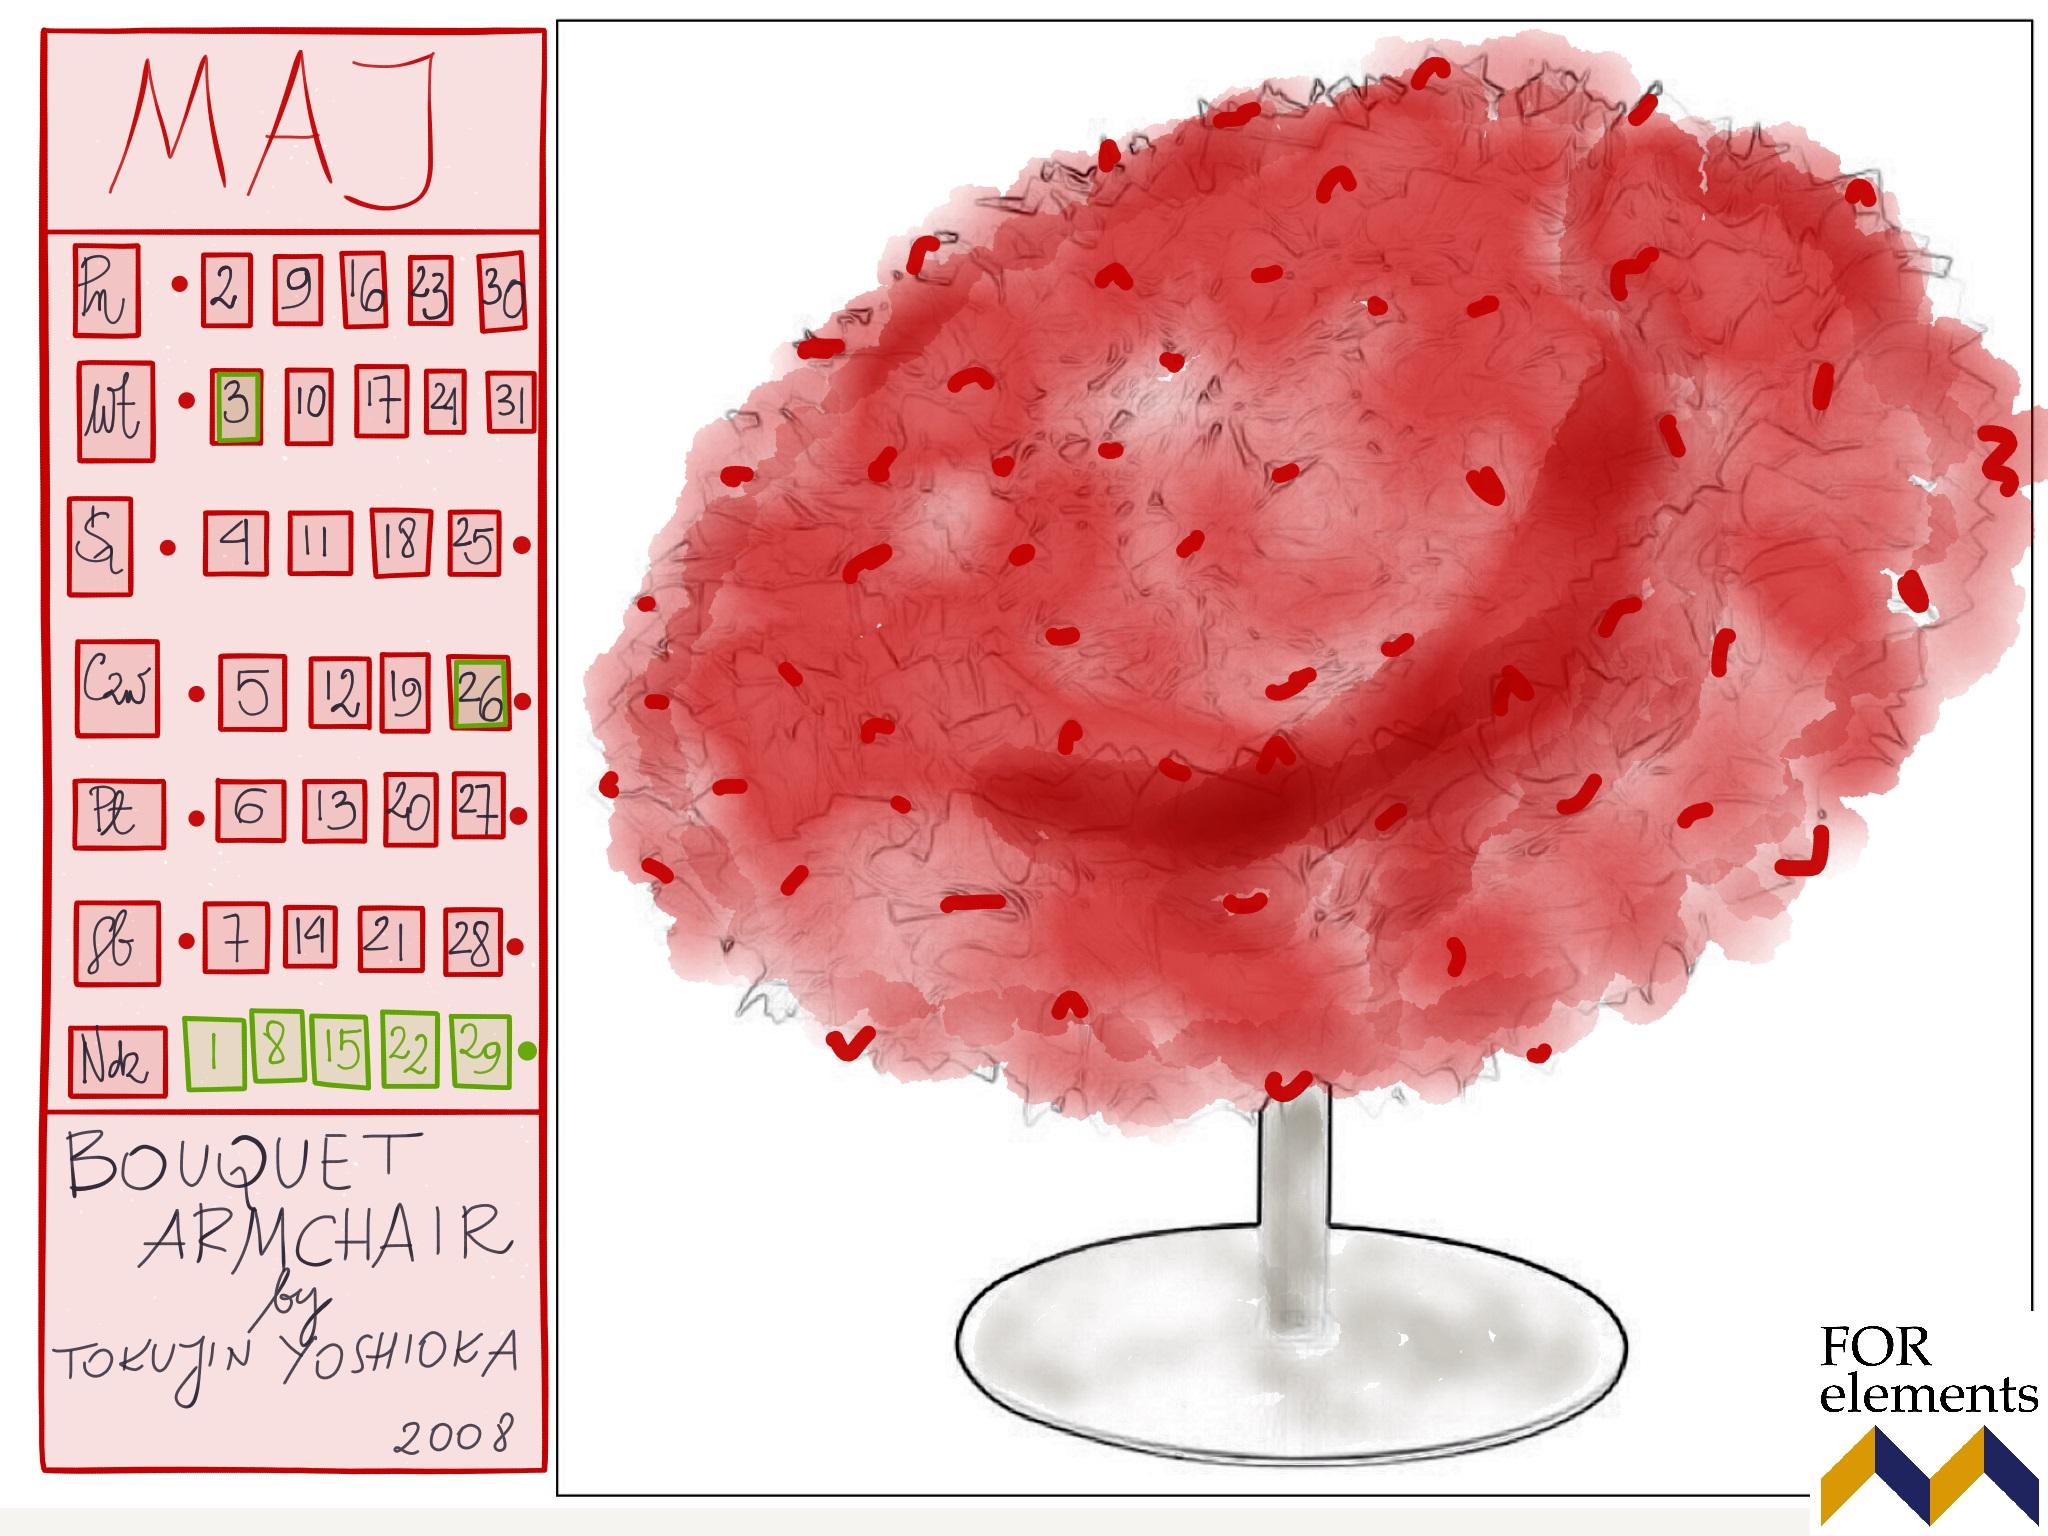 5 bouquet_armchair _tokujin_yoshioka_moroso_calendar_2016_design_icons_furniture_interior_ideas_home_decorationg_forelements_blog